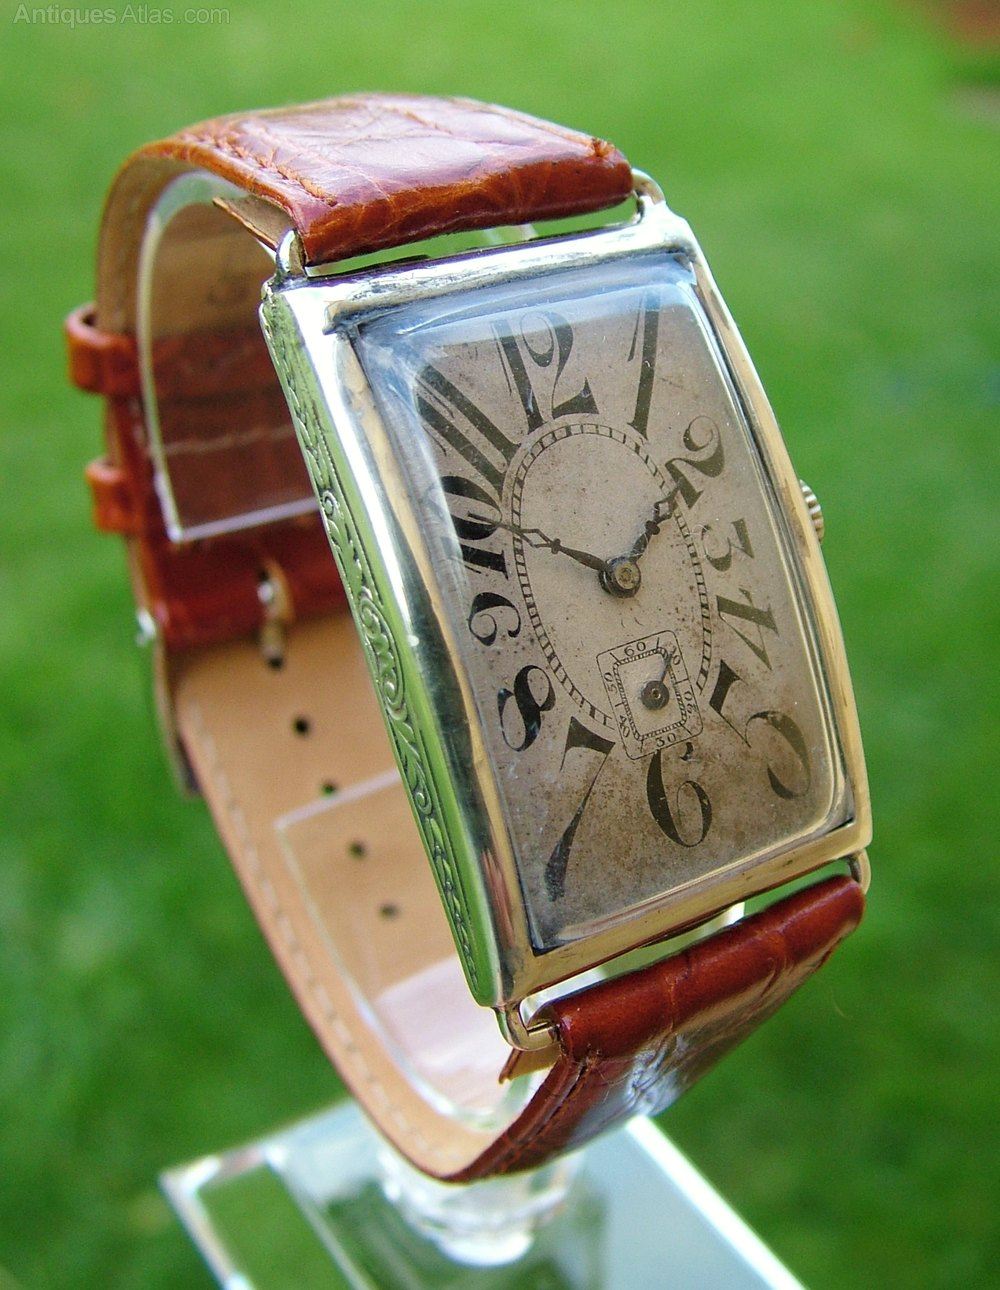 Antiques atlas a gents 1927 silver art deco wrist watch for Minimal art wrist watch